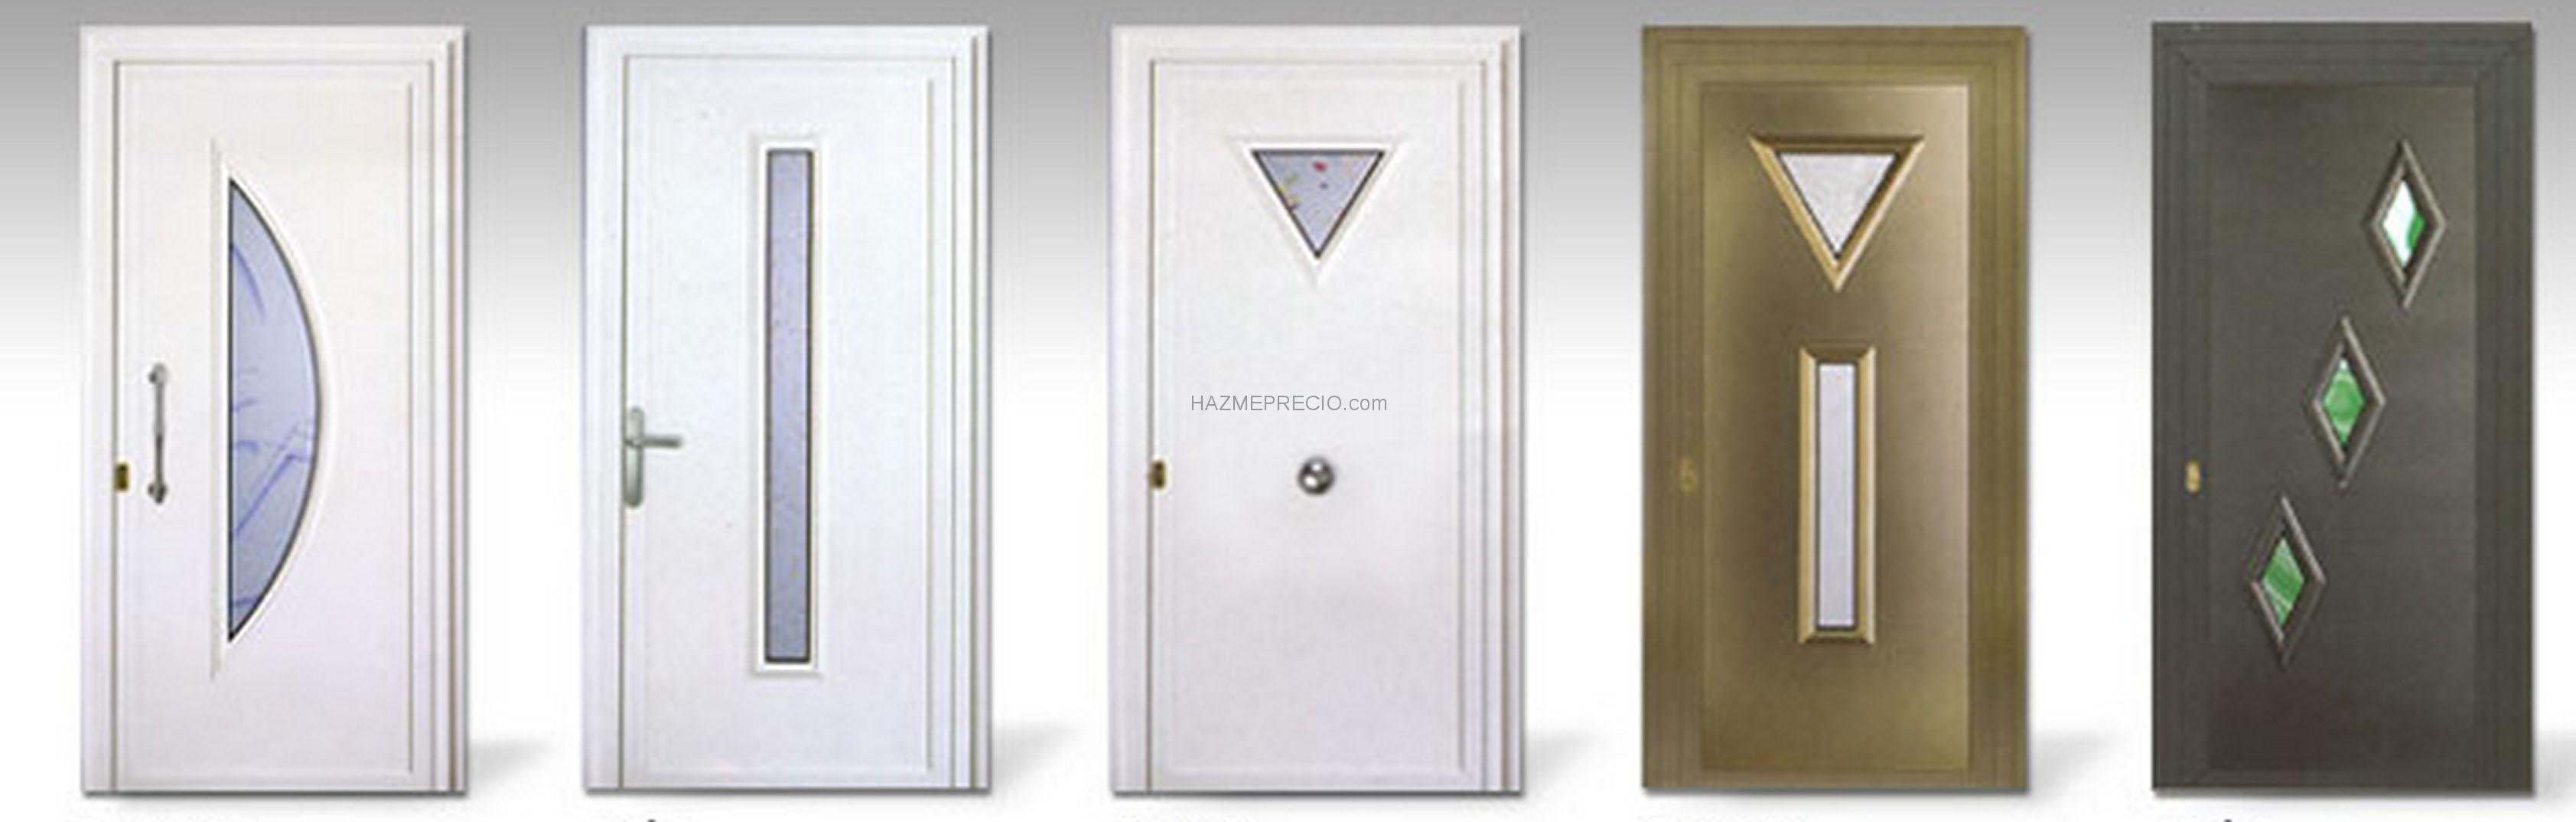 Modelos de puertas de aluminio para exterior stunning - Modelo de puertas de aluminio ...